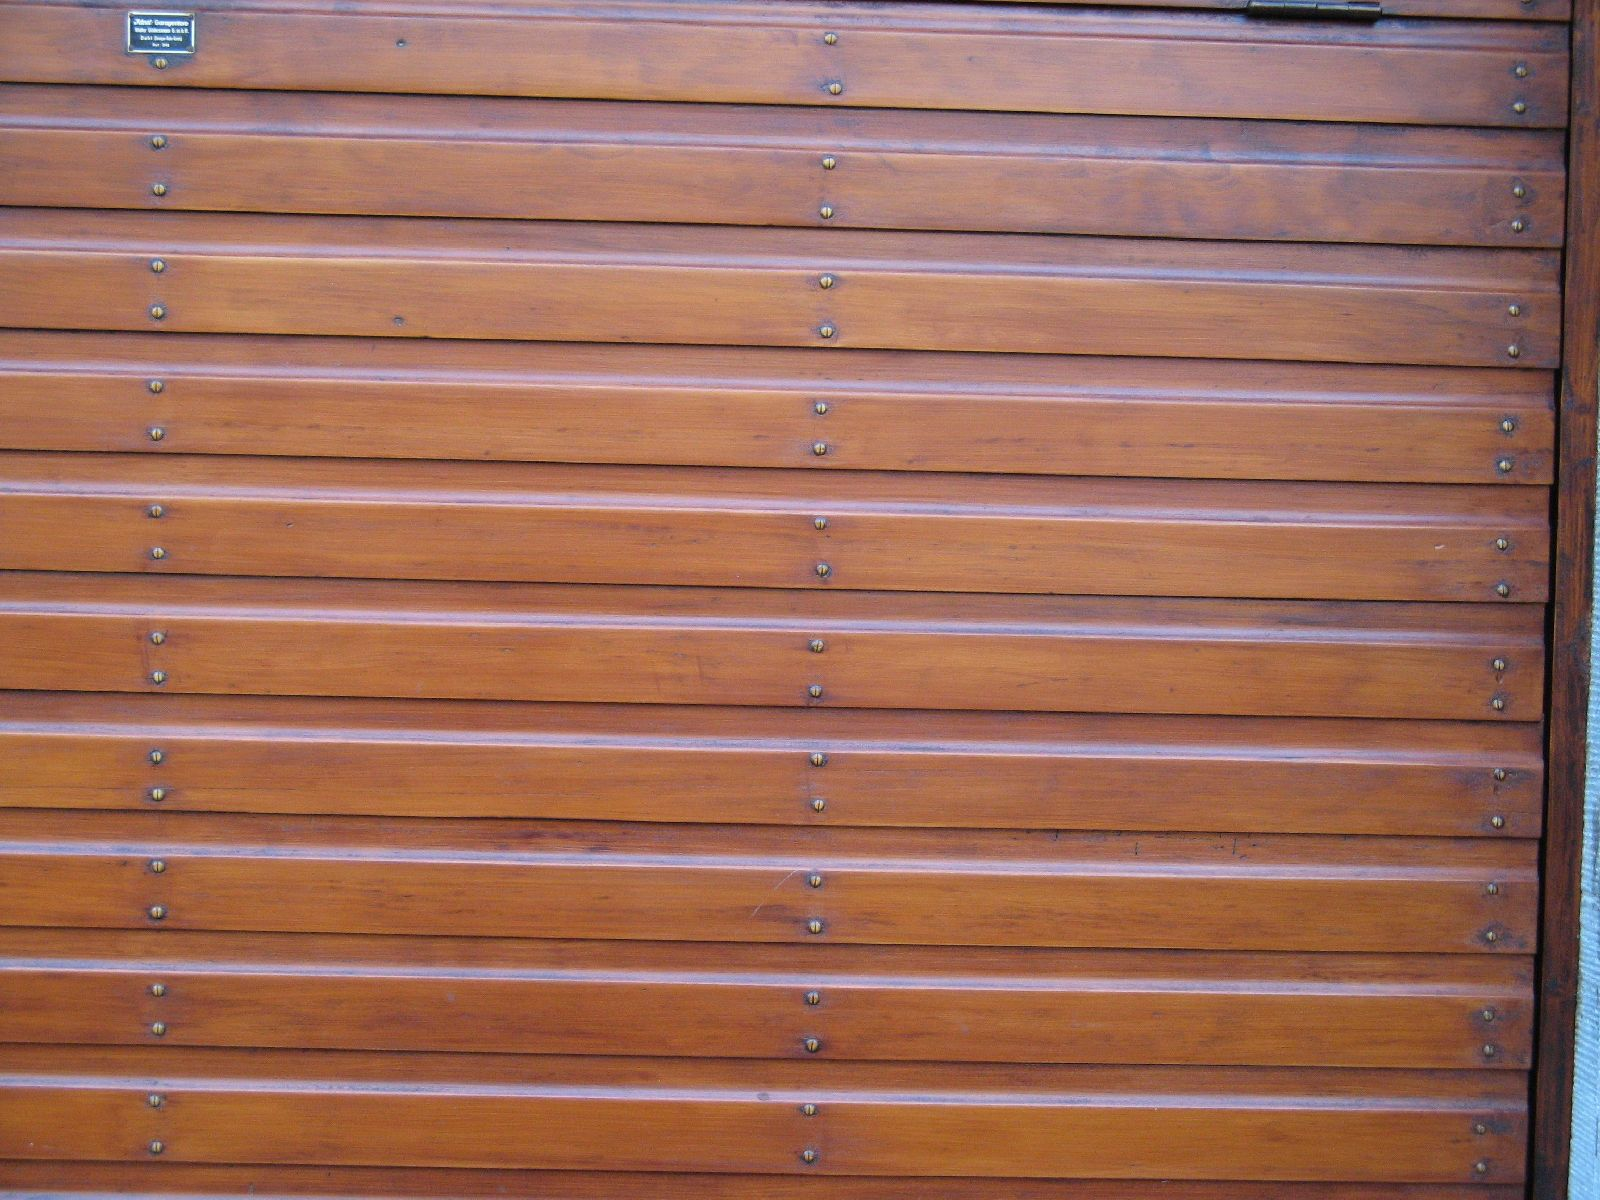 Wood_Textures_B_1600